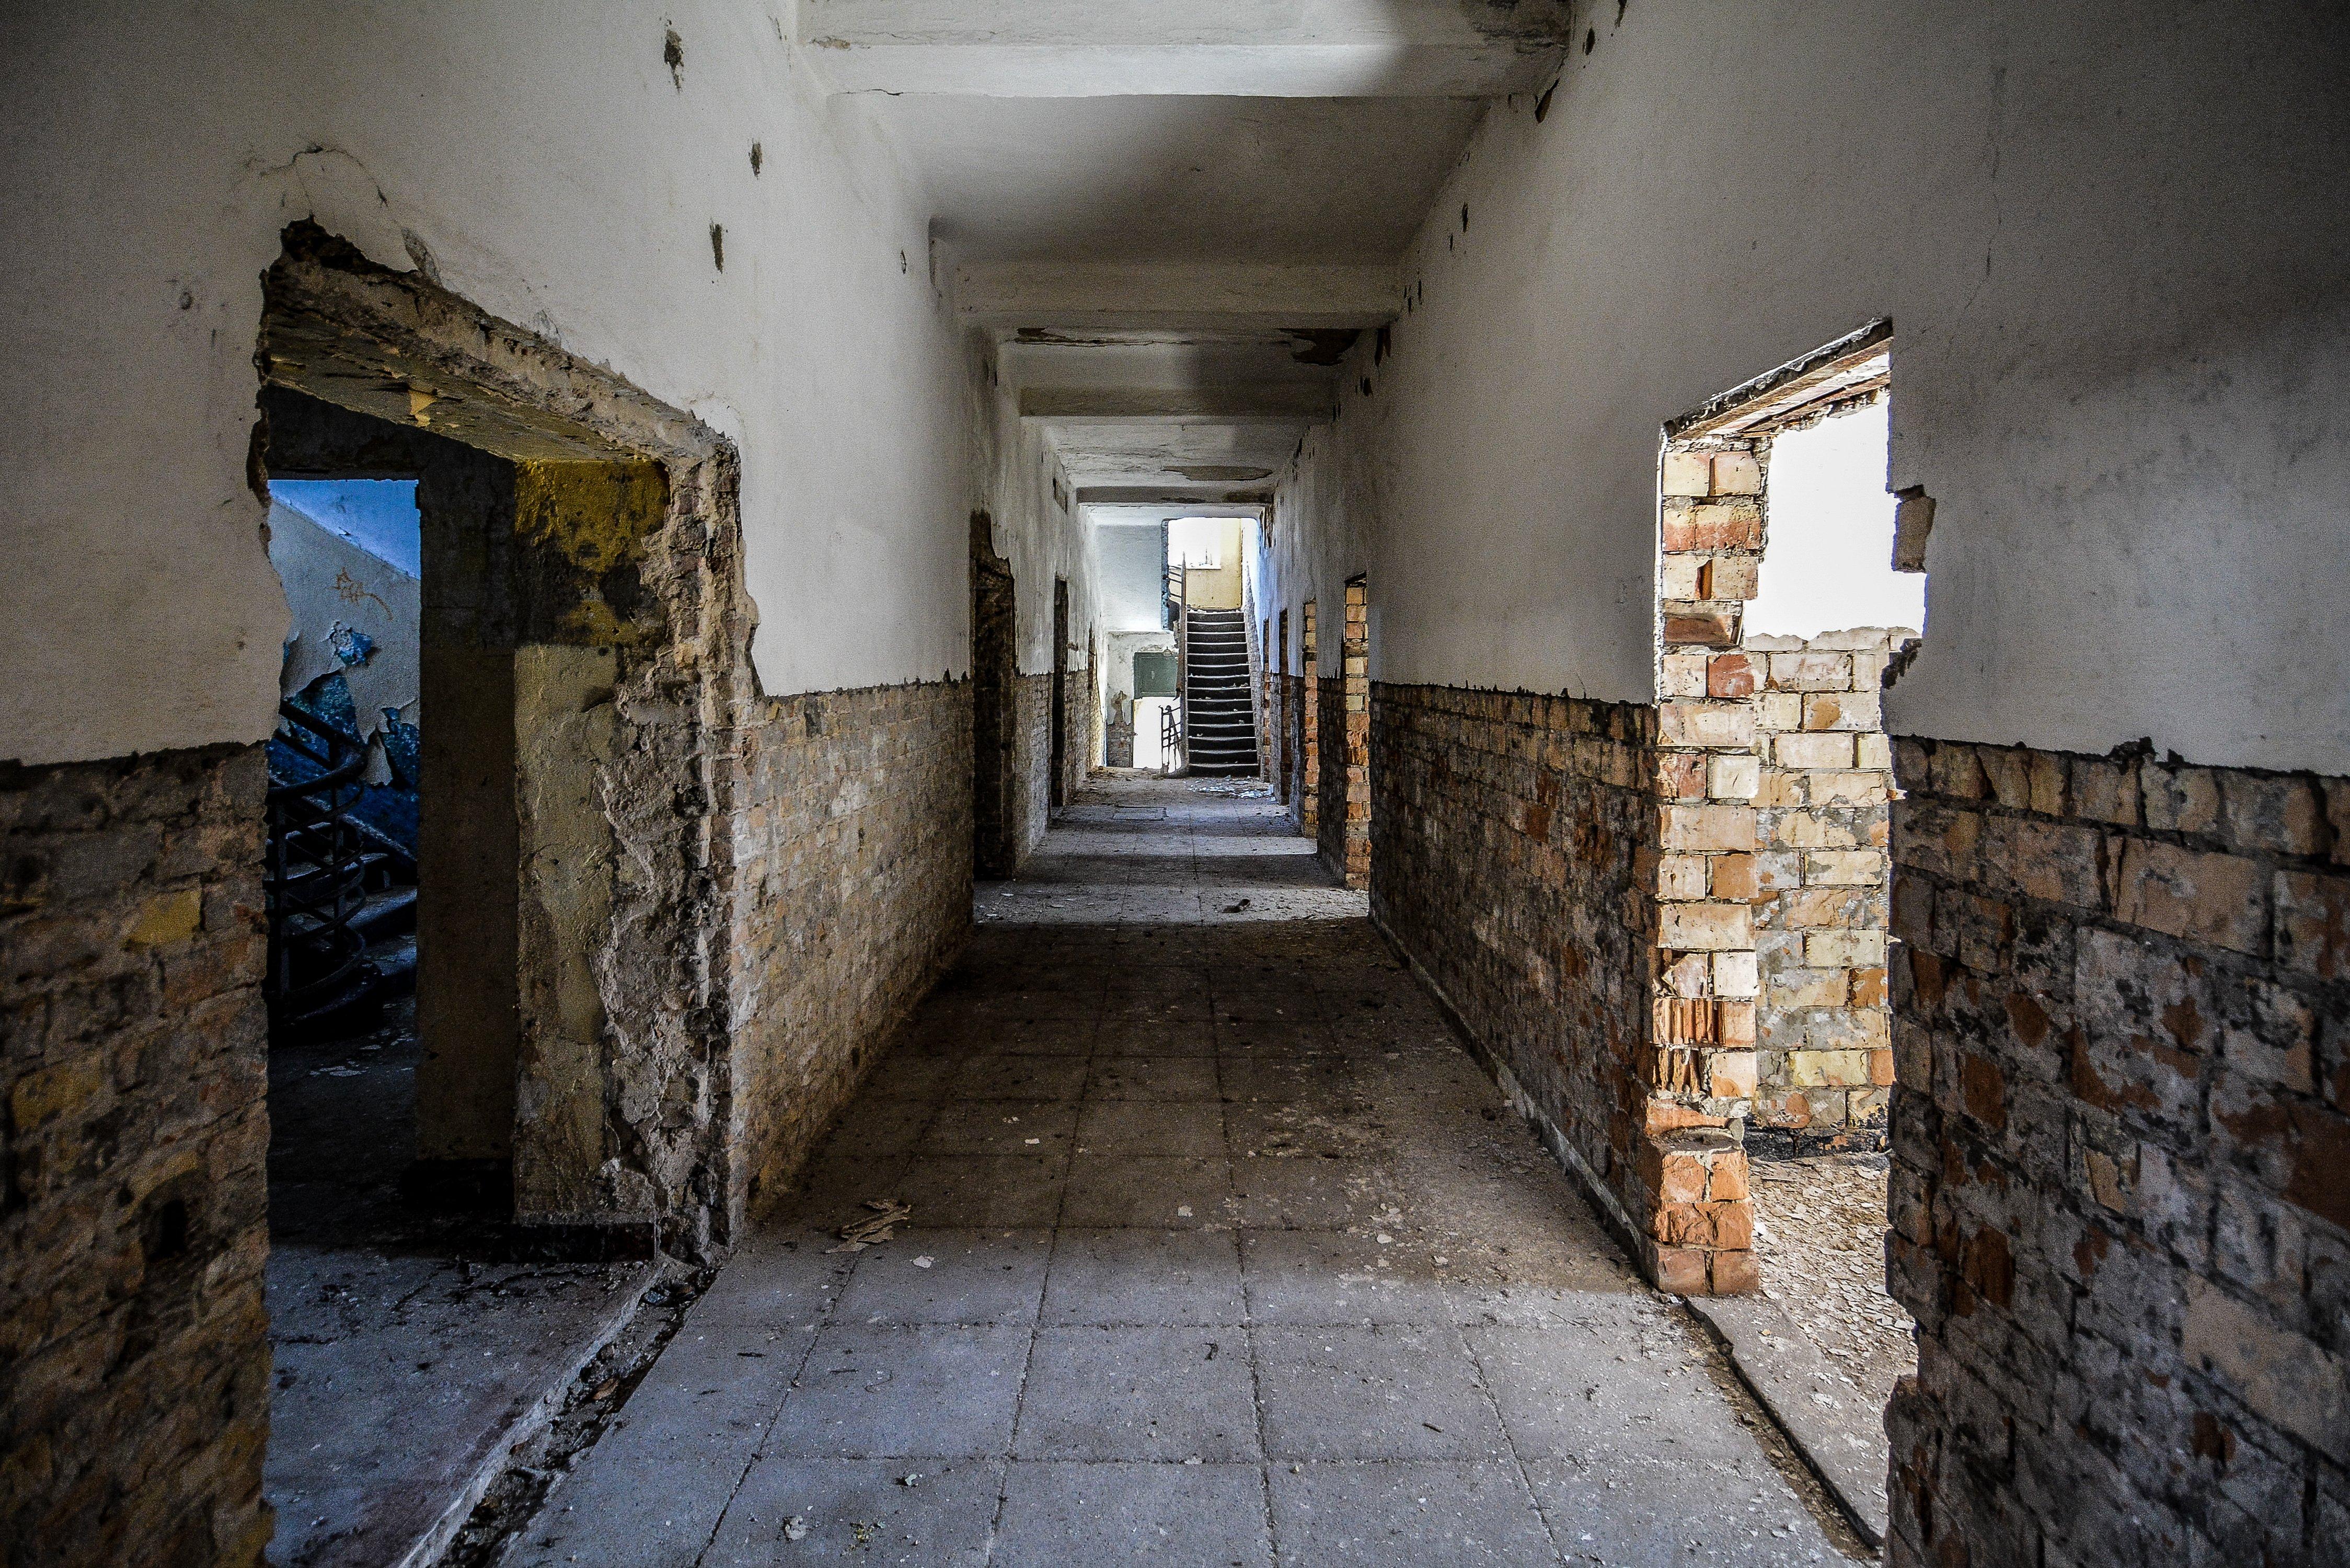 white walls brick nazi soviet military base abandoned urbex urban exploring loewen adler kaserne elstal wustermark roter stern kaserne germany lost places